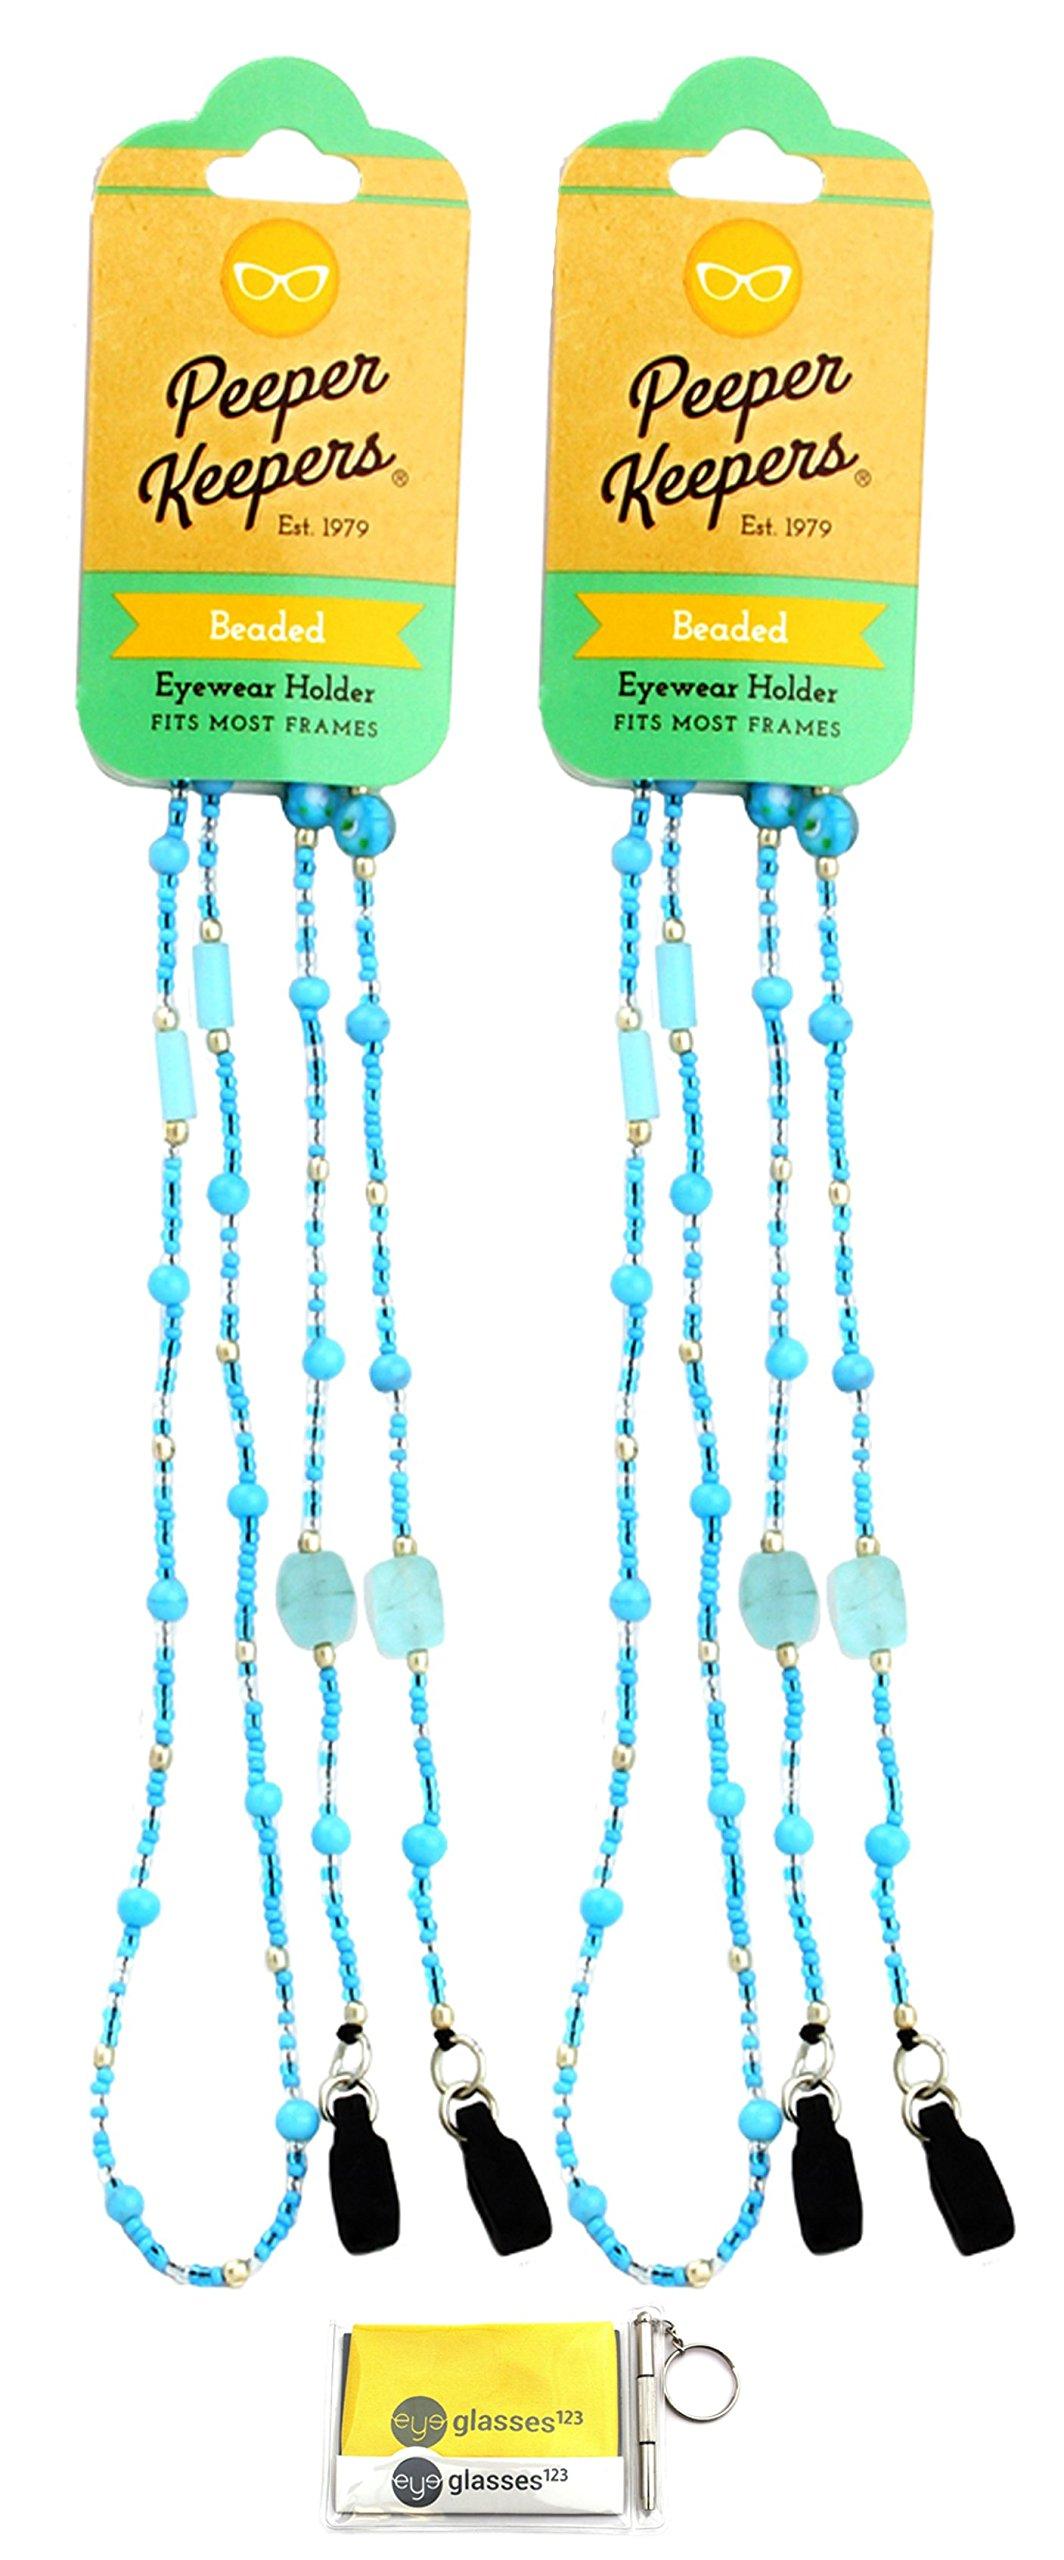 Eyeglass Retainer, Sunglass Chain By Peeper Keepers Glass Beads, Aqua Jewel, 2pk | w/Microfiber Cloth, Screwdriver